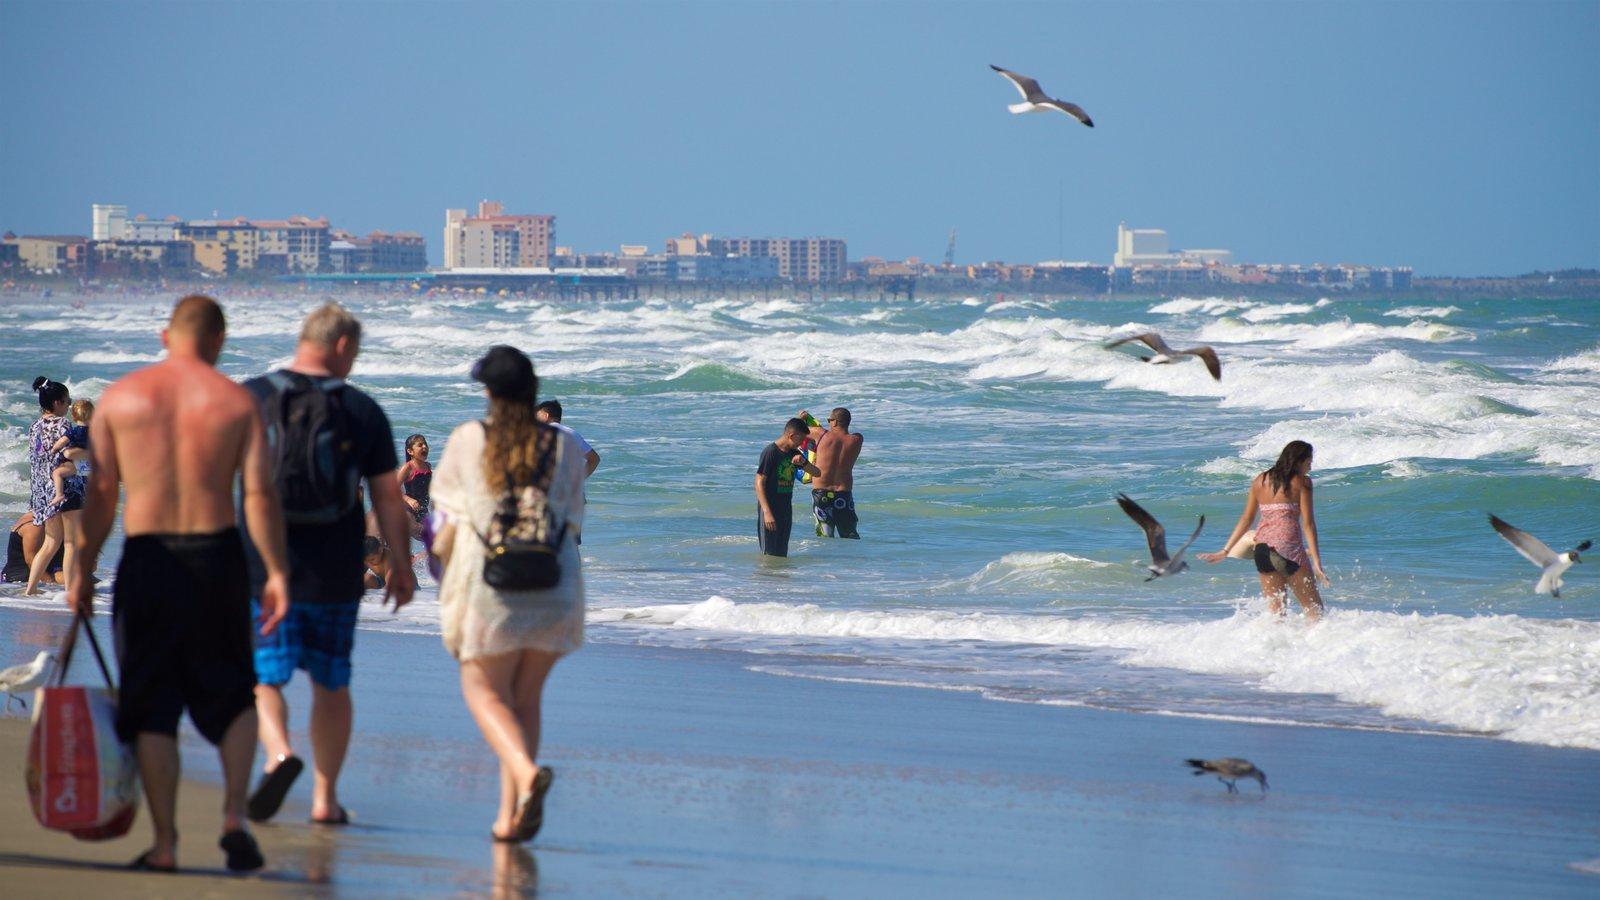 Cocoa Beach featuring a beach, general coastal views and swimming